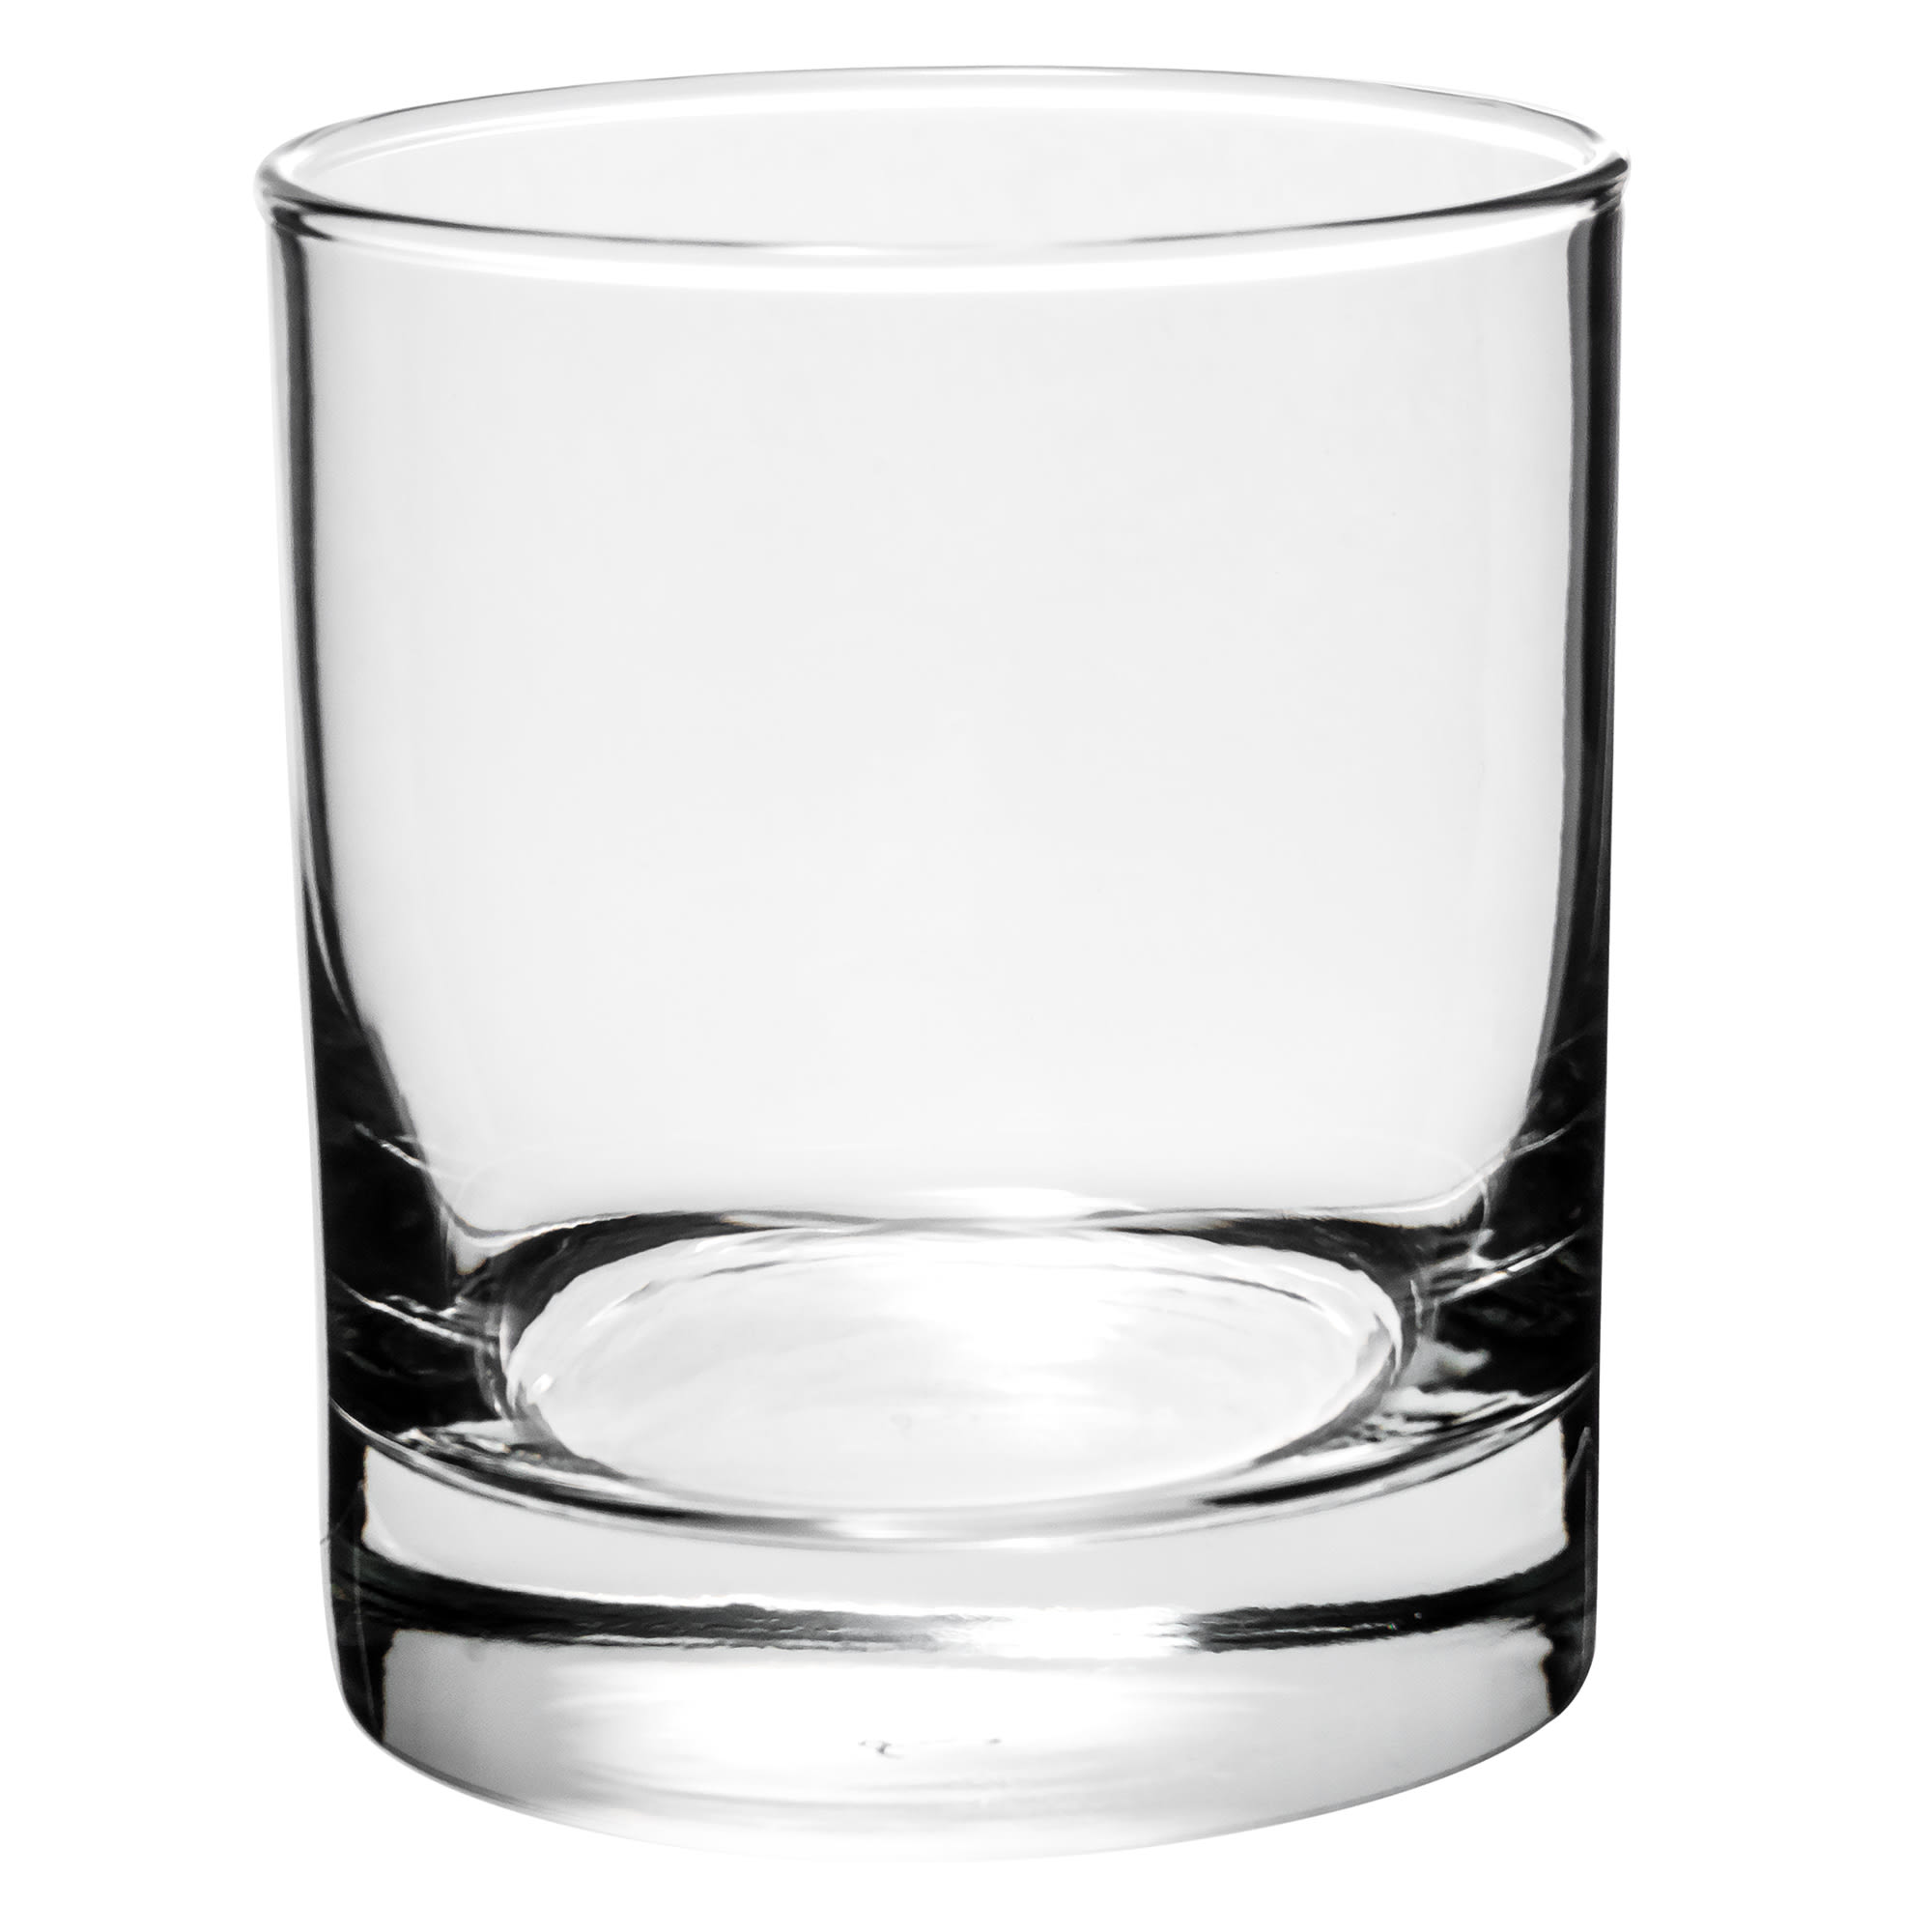 Libbey 2524 10.25-oz Chicago Old Fashioned Glass - Safedge Rim Guarantee